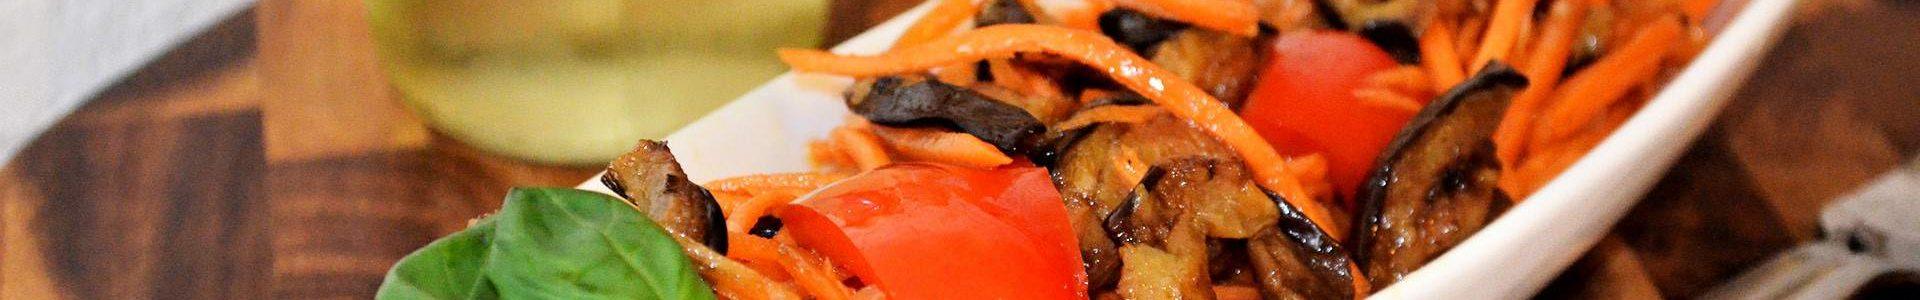 Салат с морковью по-корейски и баклажанами